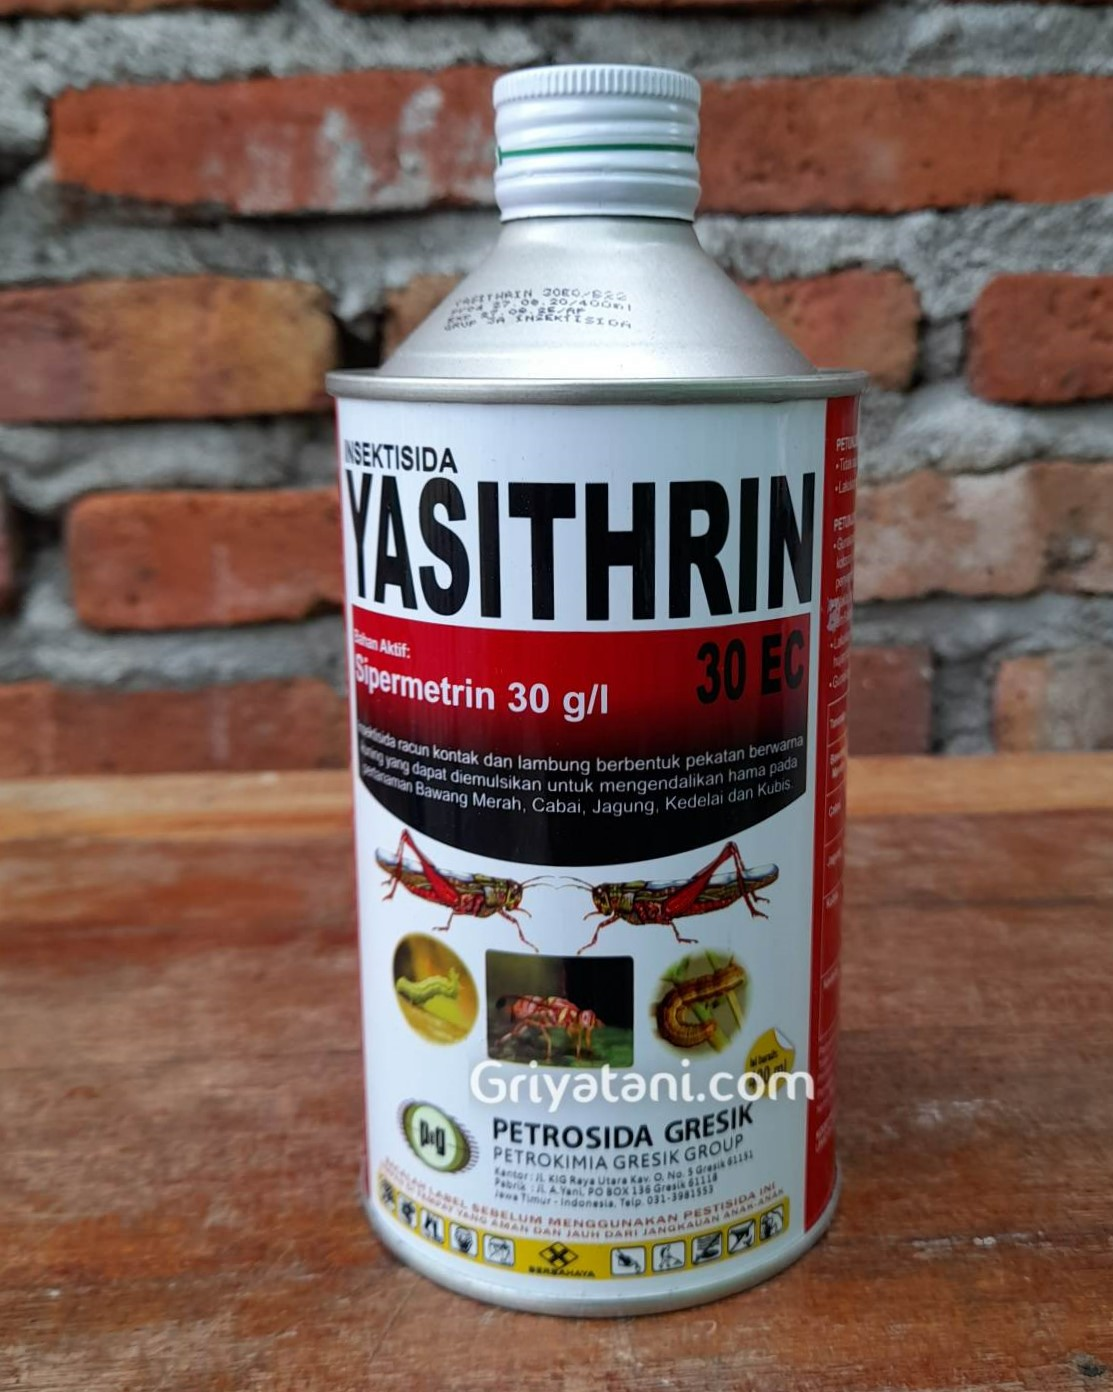 Yasithrin 30 EC